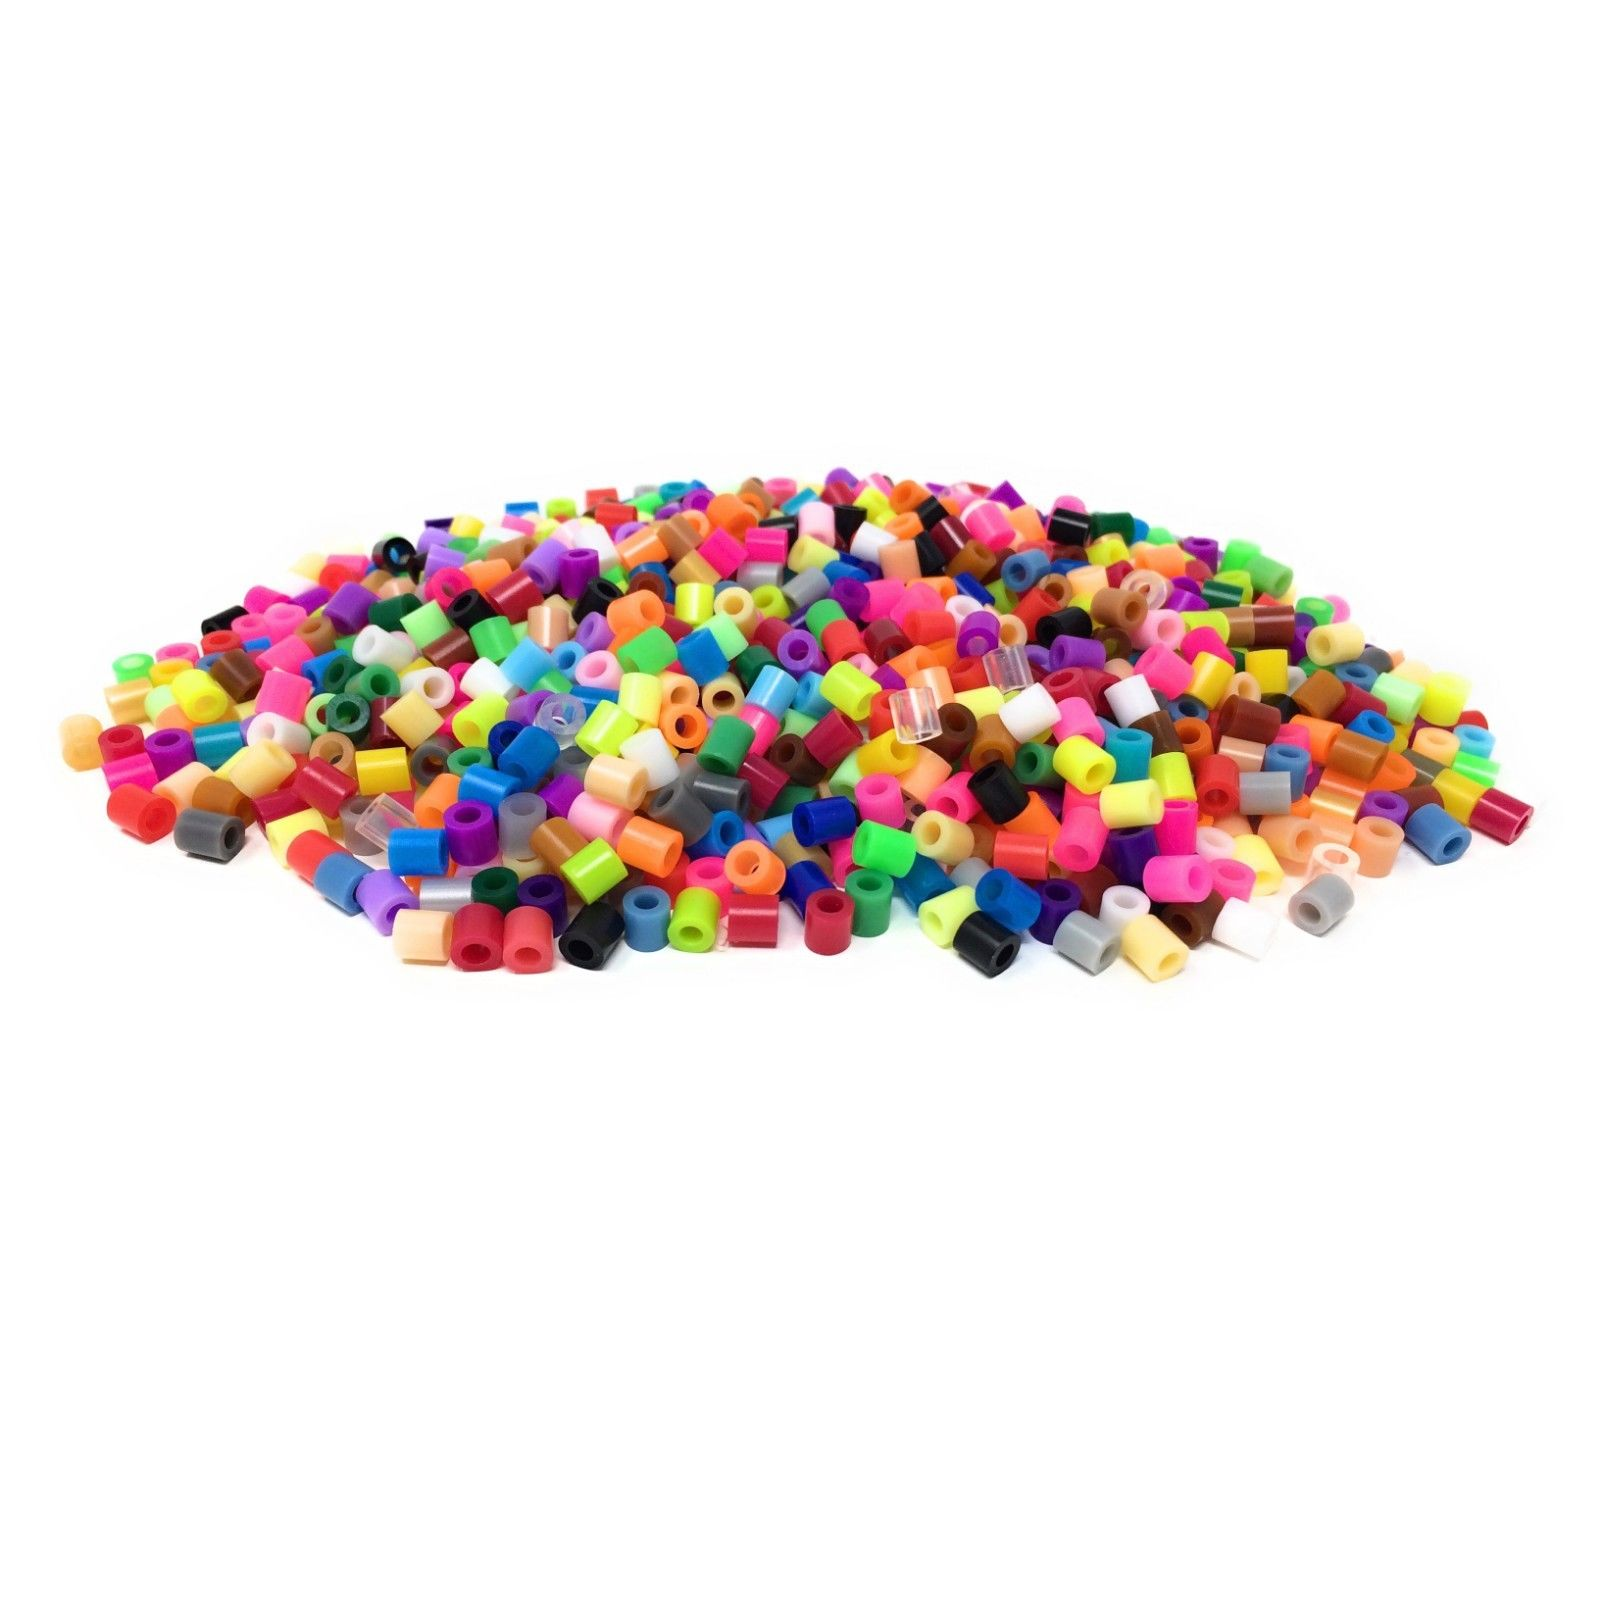 JINLETONG Hama Beads 5mm 1000pcs perler Iron Beads for Kids Hama Beads Diy 3d puzzles  High Quality Handmade Gift Toy 14